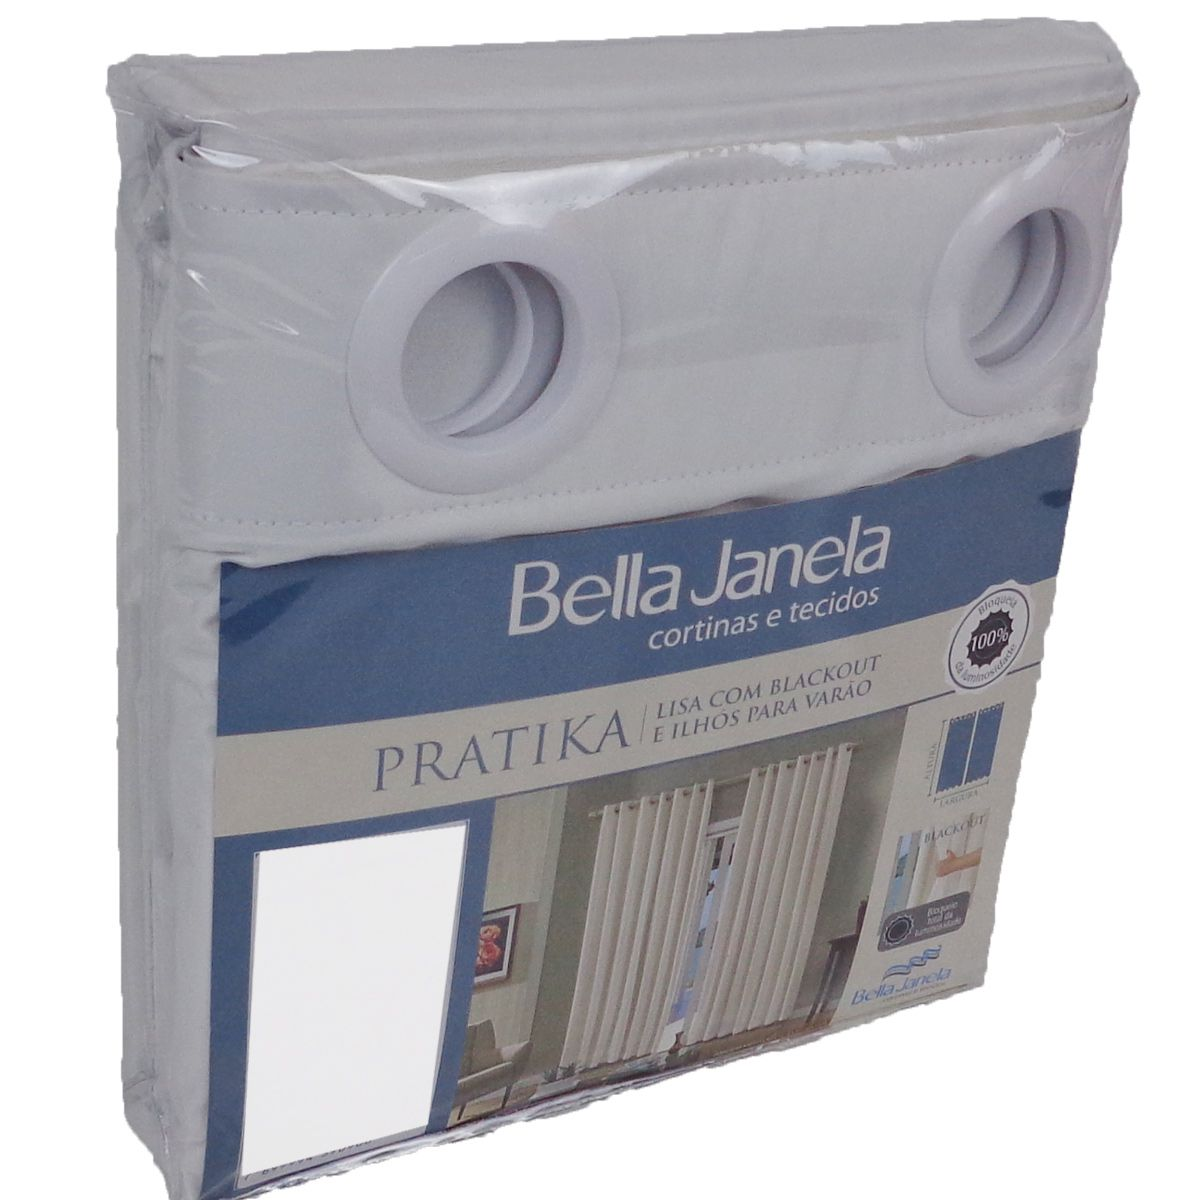 Cortina Branca Em Voil Com Forro Blackout 2,60 x 1,70 Bella Janela